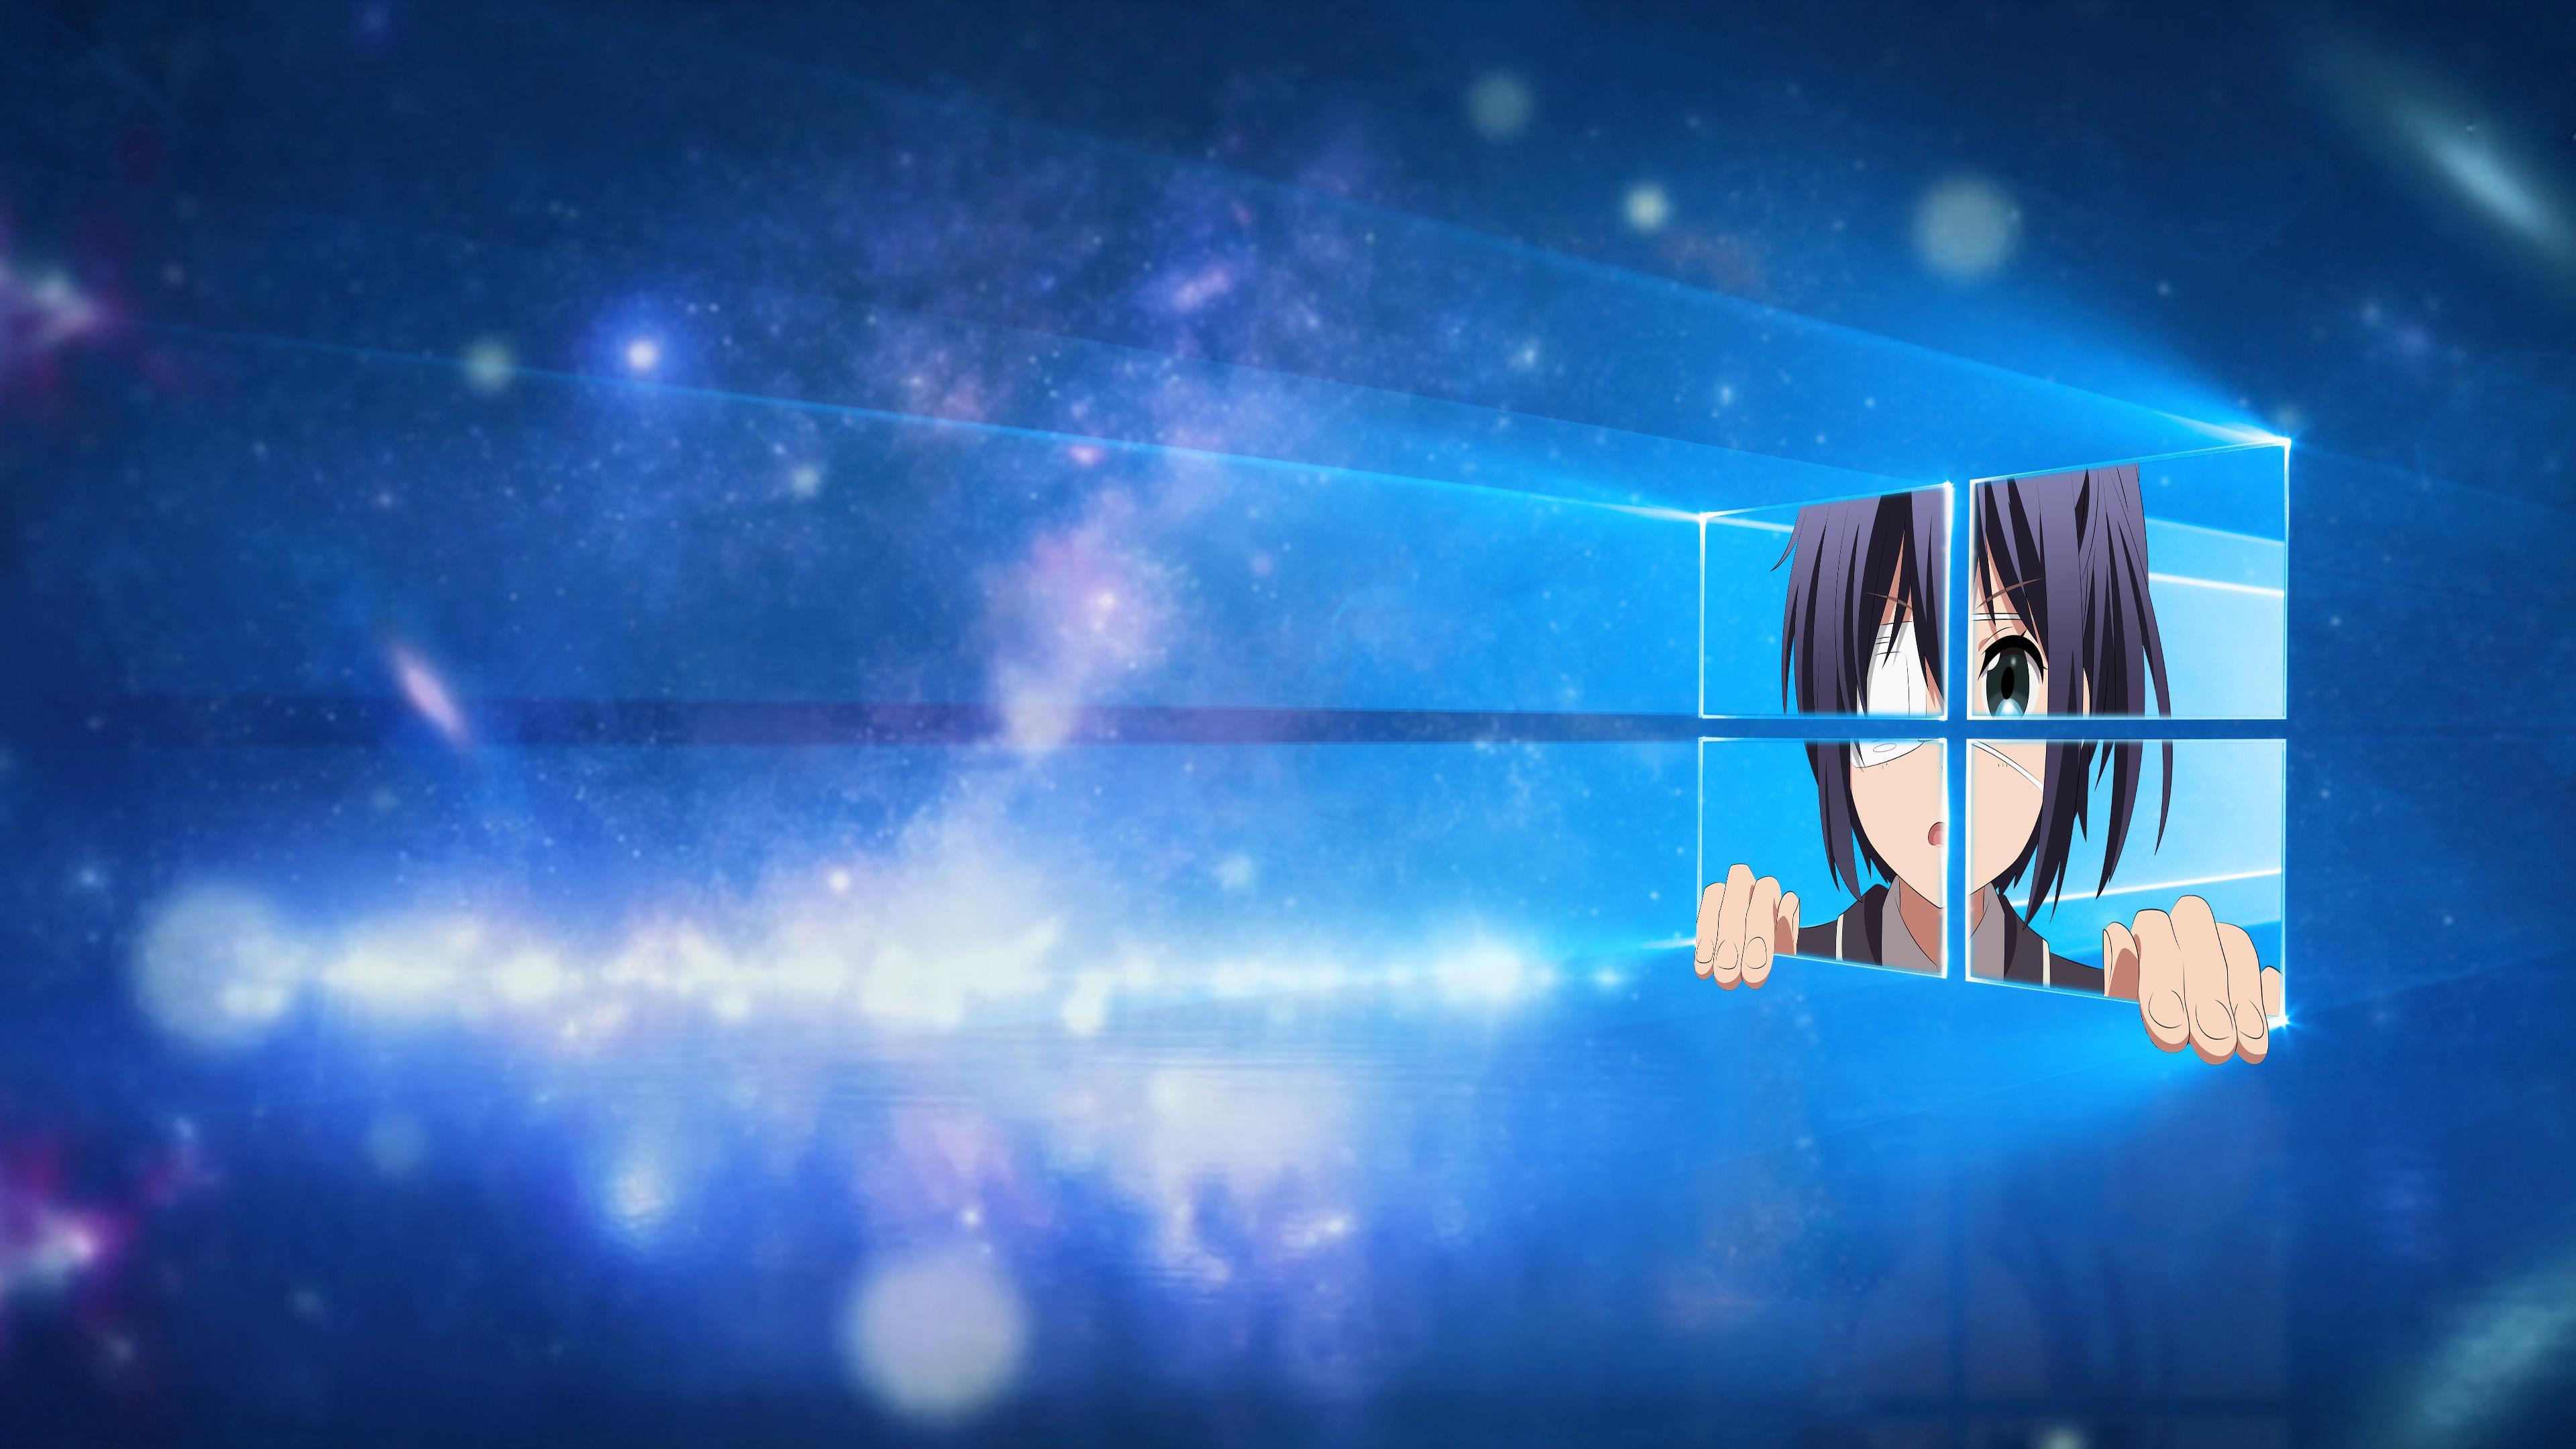 Free Download Windows 10 Wallpaper Chuunibyou Style 4k